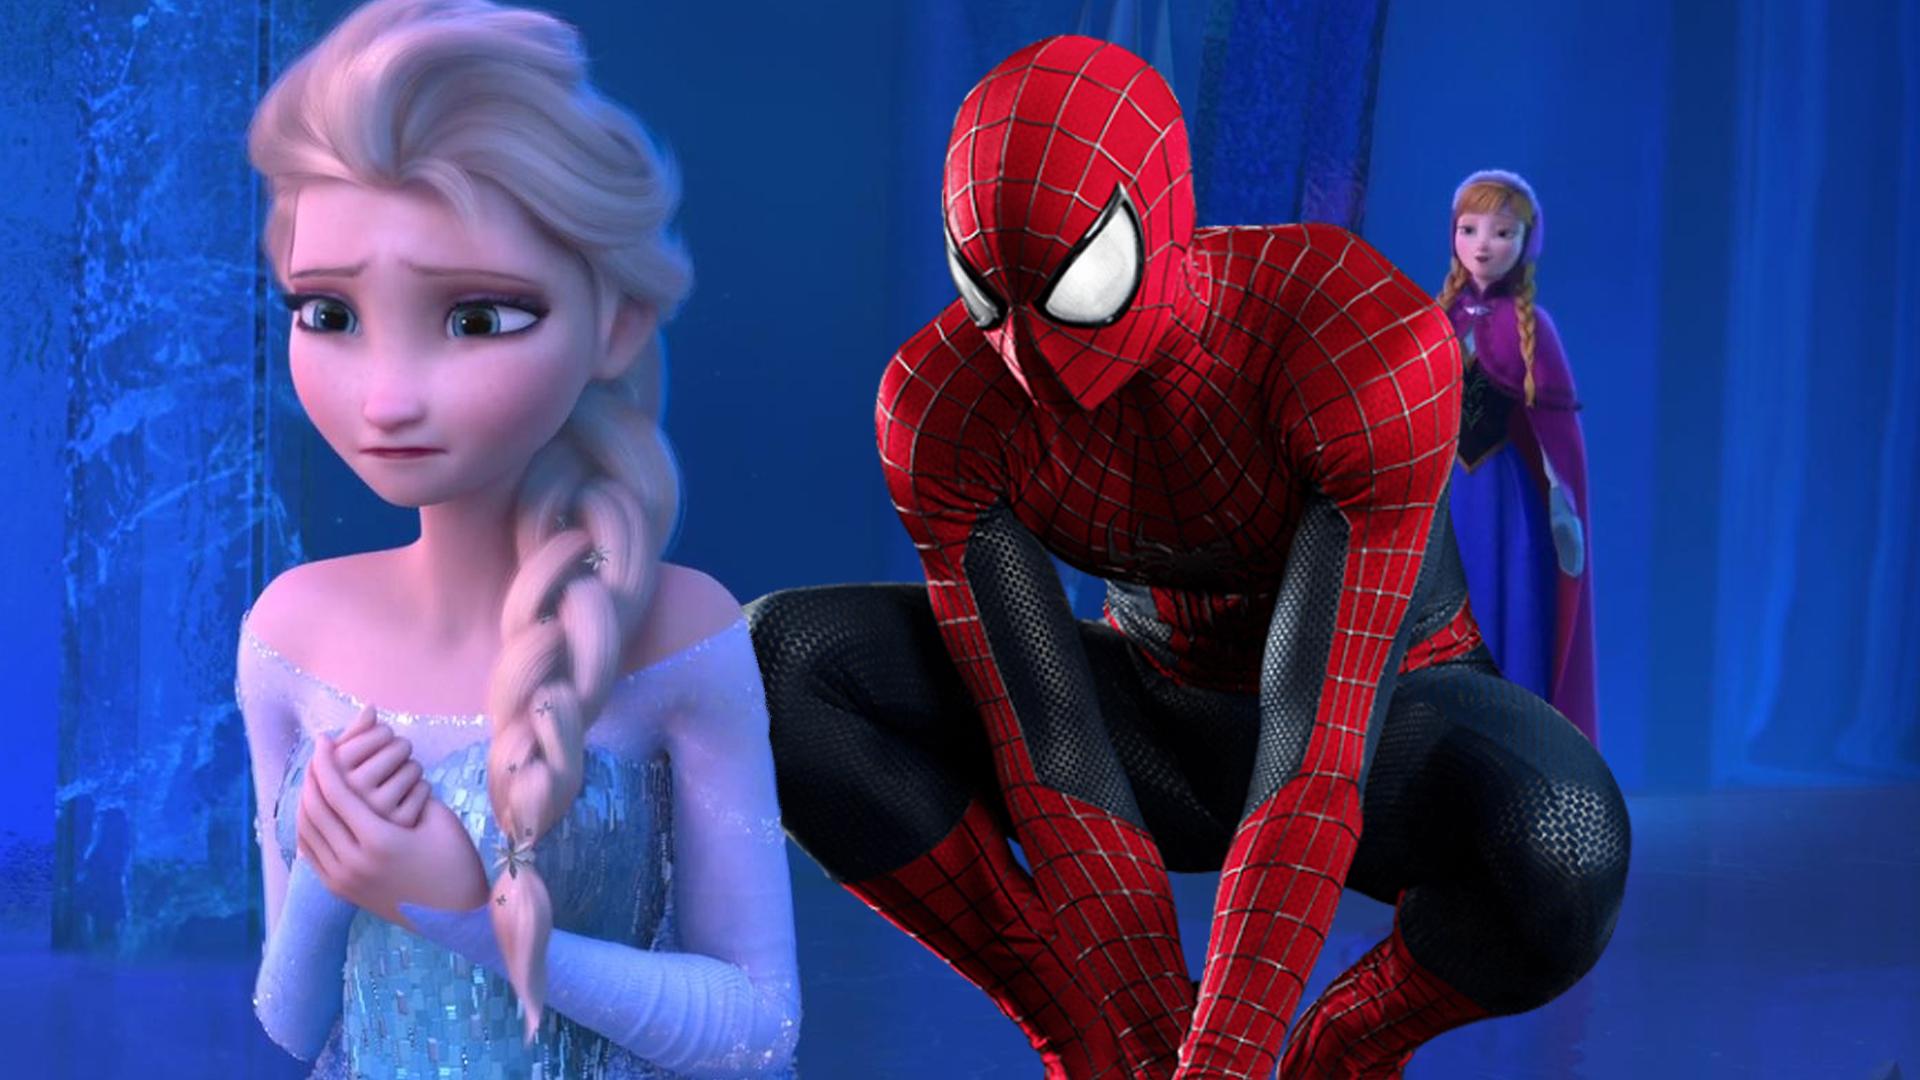 spiderman vs elsa